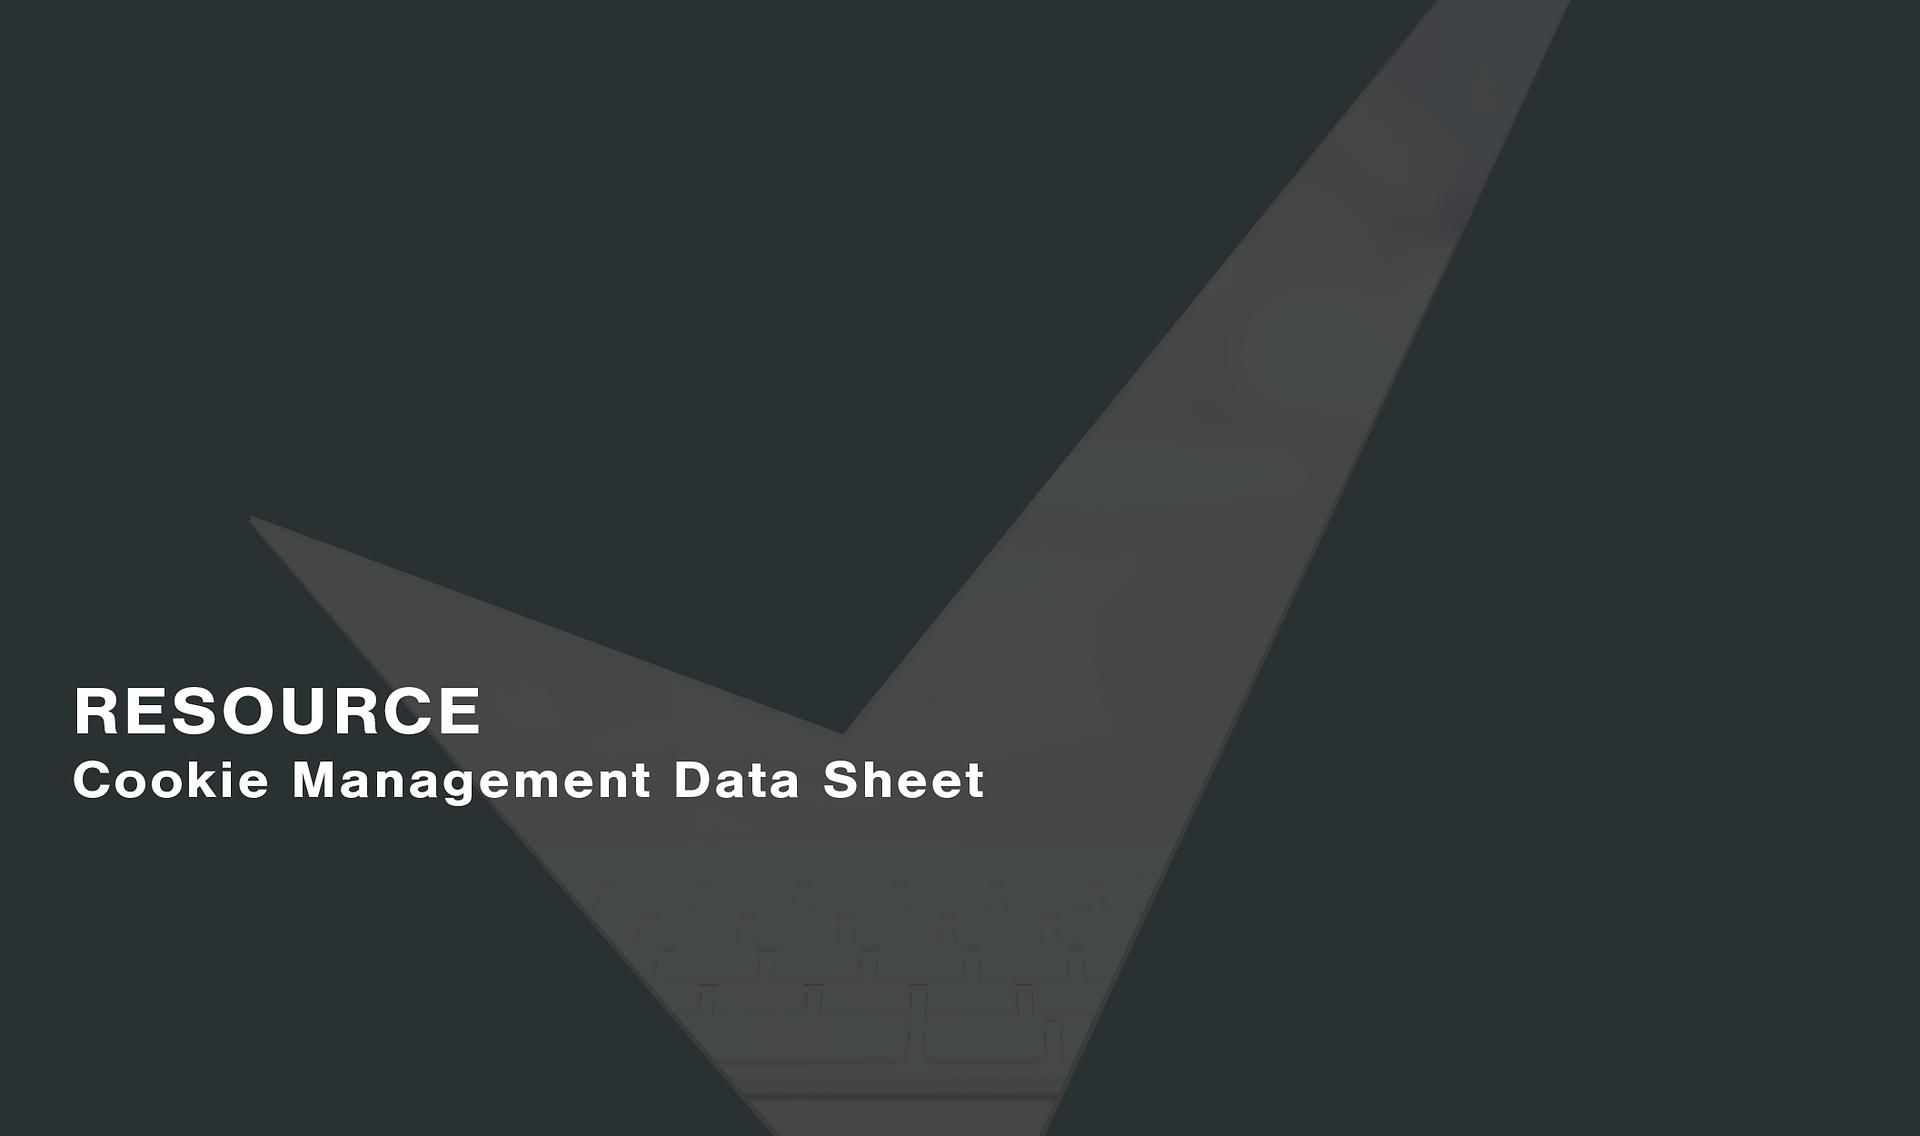 Cookie-Management-Data-Sheet